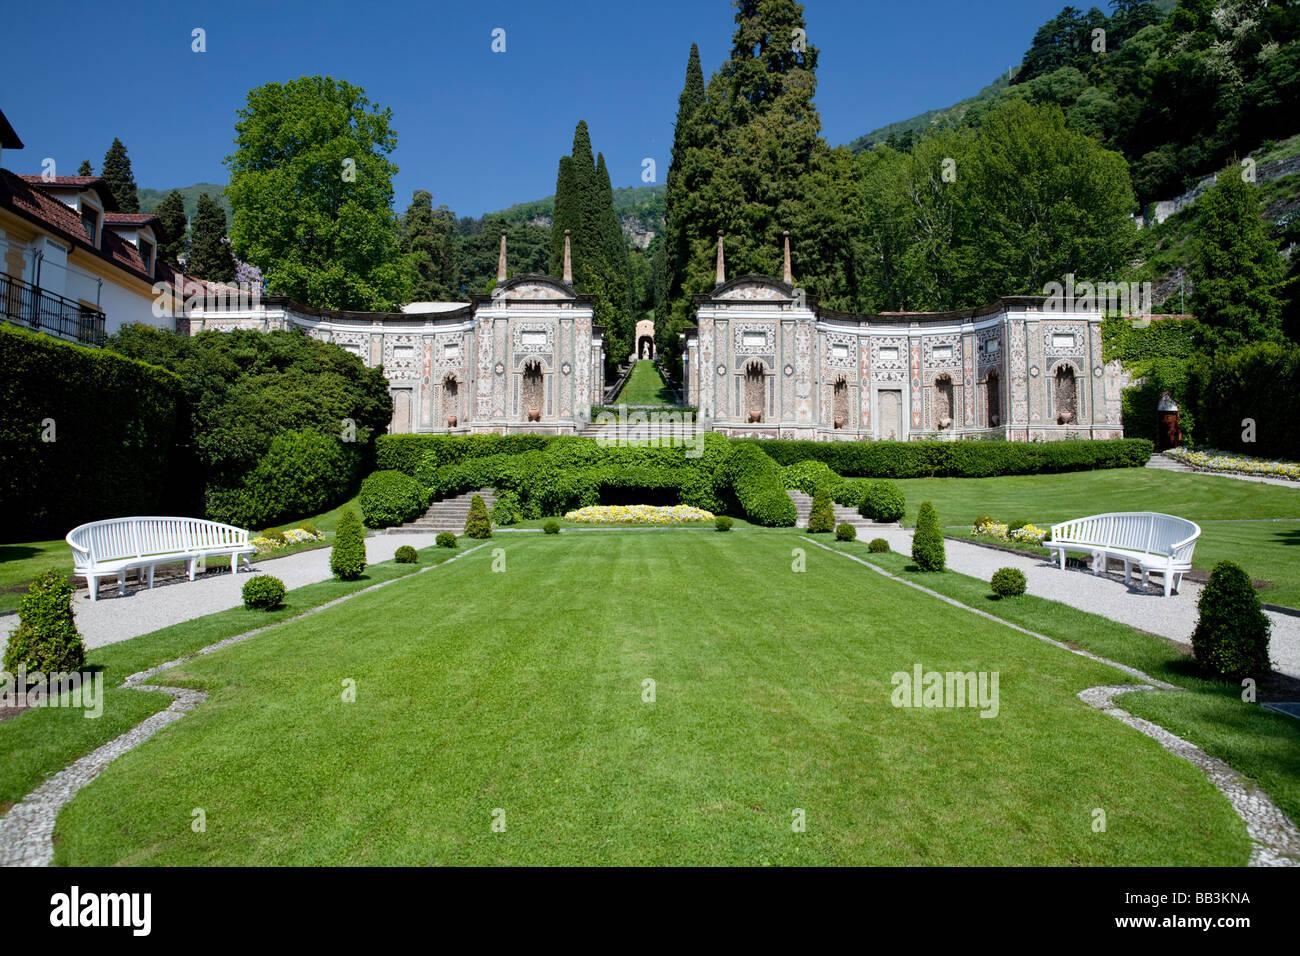 Antique minareto in the park of villa d 39 este luxury hotel for Hotel villa d este como